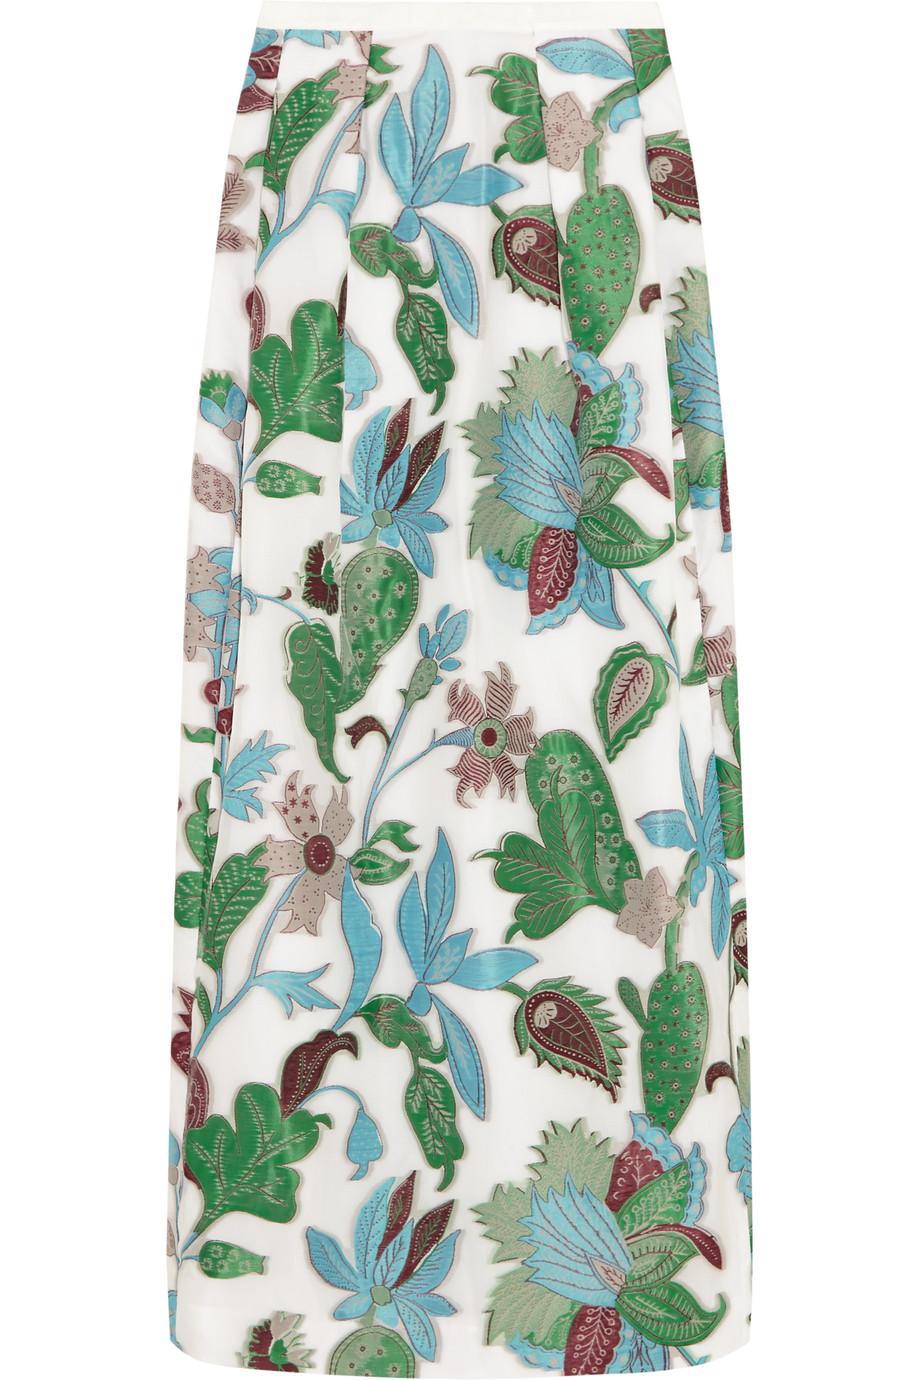 Tory Burch Embroidered Organza Maxi Skirt, Blue/Green, Women's, Size: 8